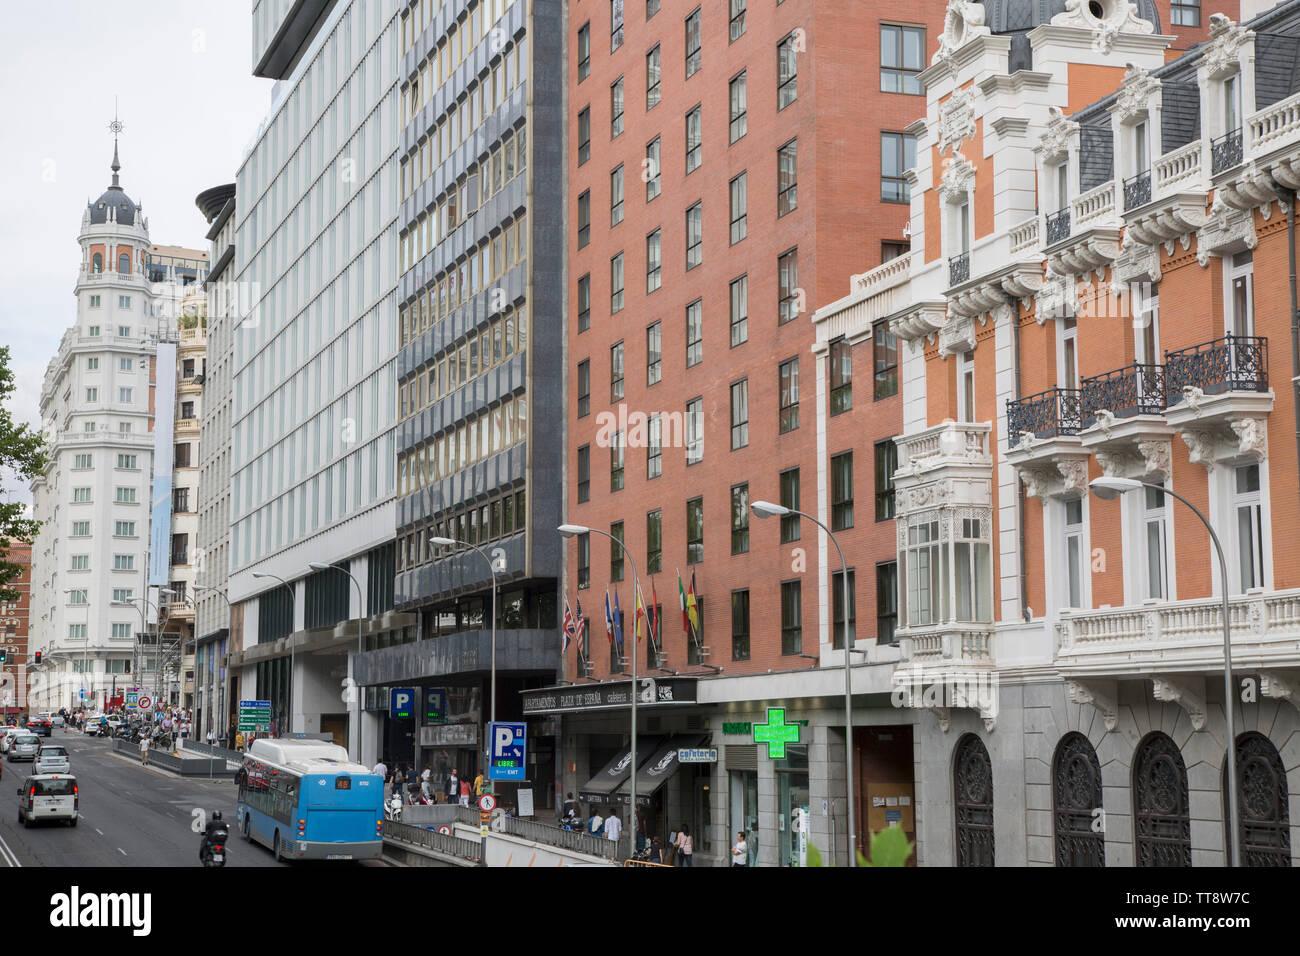 Facades on Plaza de Espana Square, Madrid, Spain - Stock Image